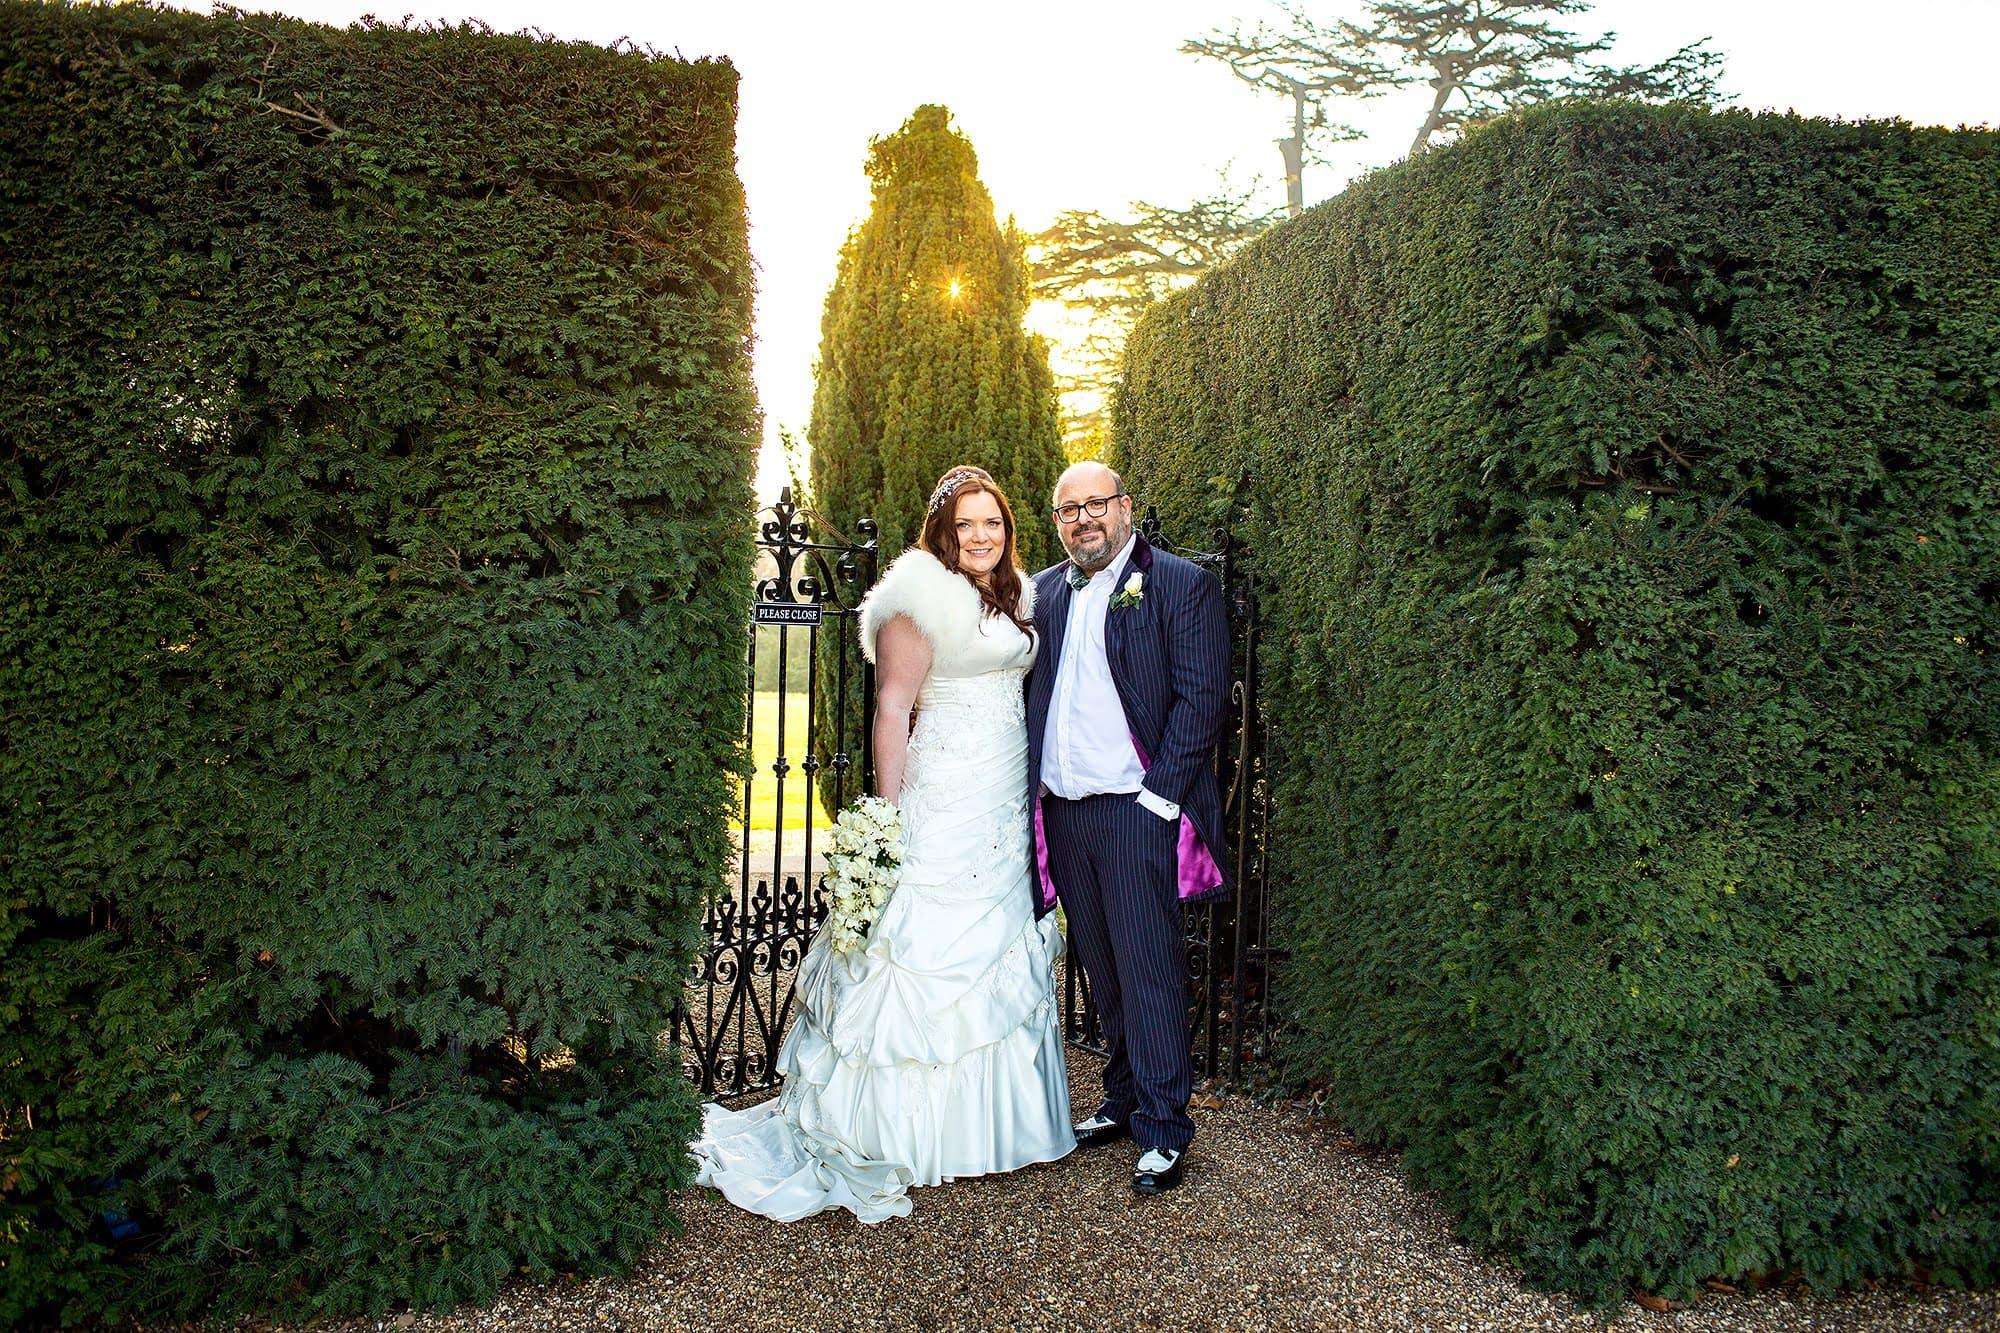 Hedsor House wedding photos of Anna and Tim